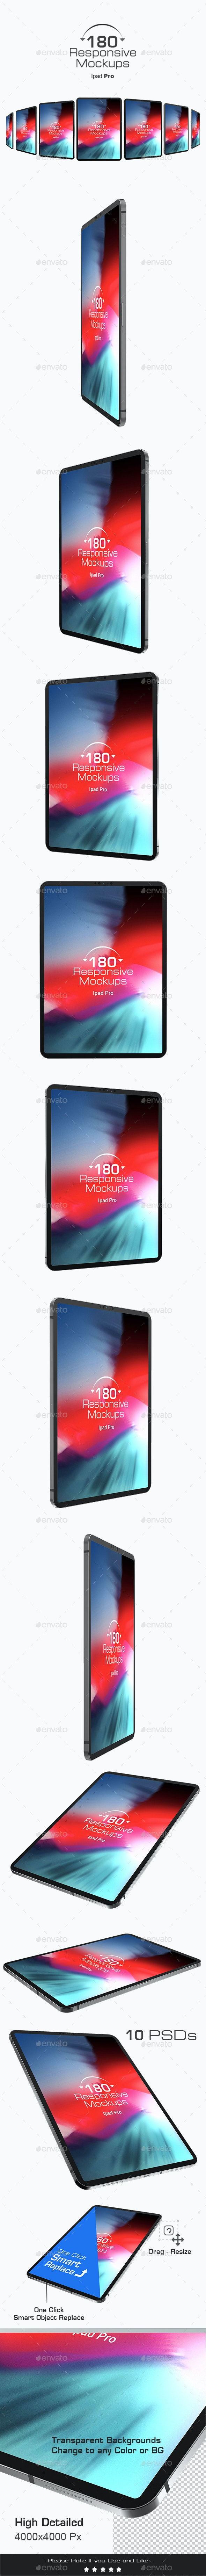 180 Responsive 3D Mockups - Pad Pro - Mobile Displays